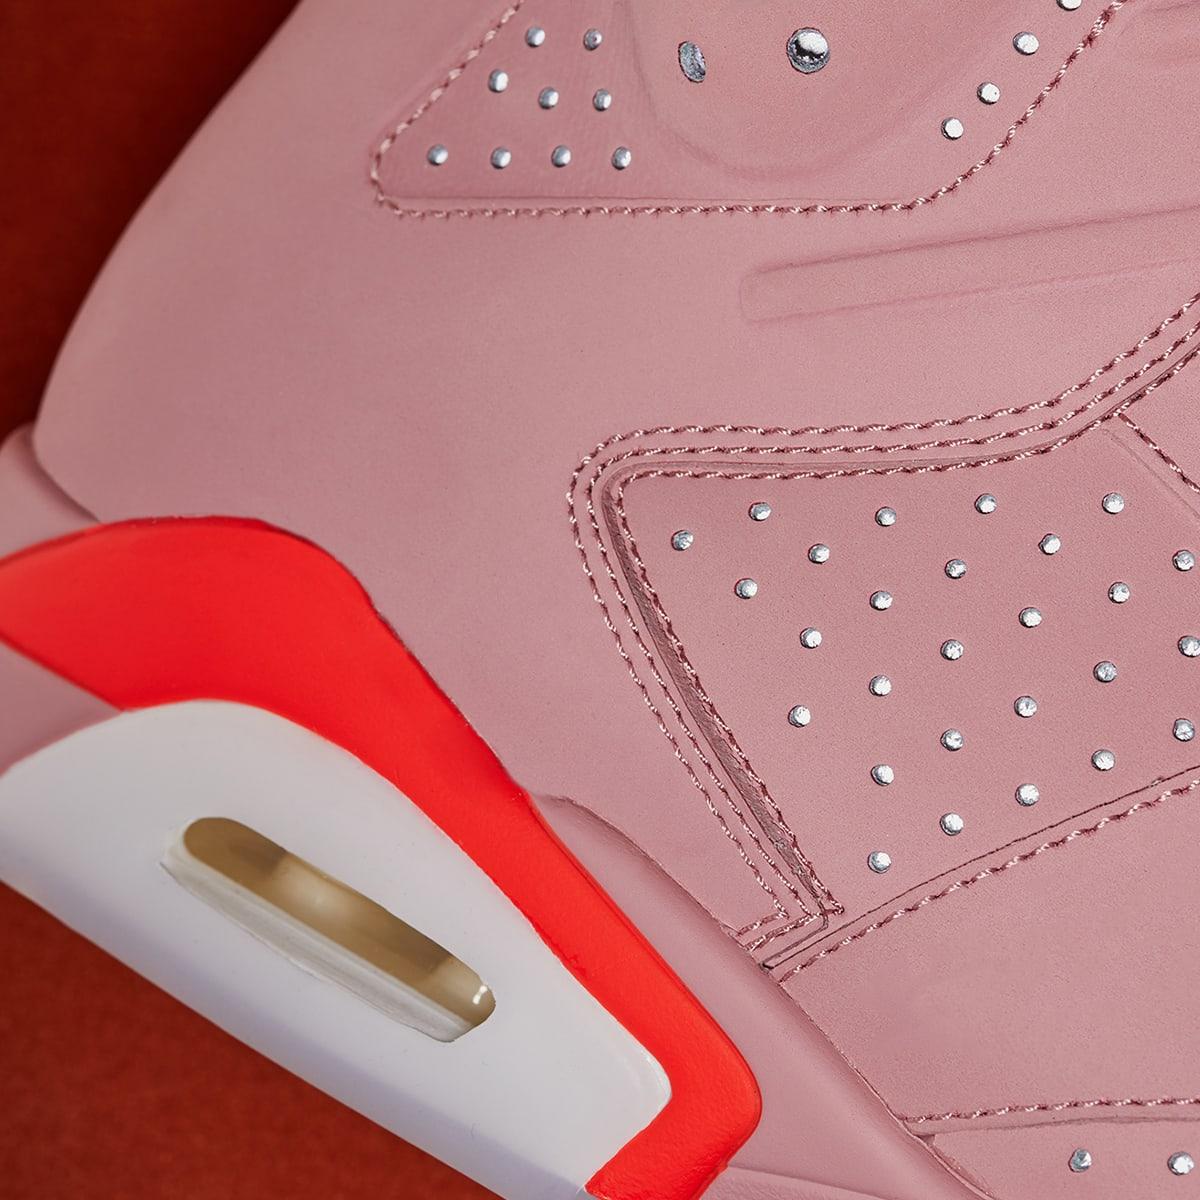 info for 45cb5 69141 Air Jordan 6 Retro (Rust Pink & Bright Crimson)